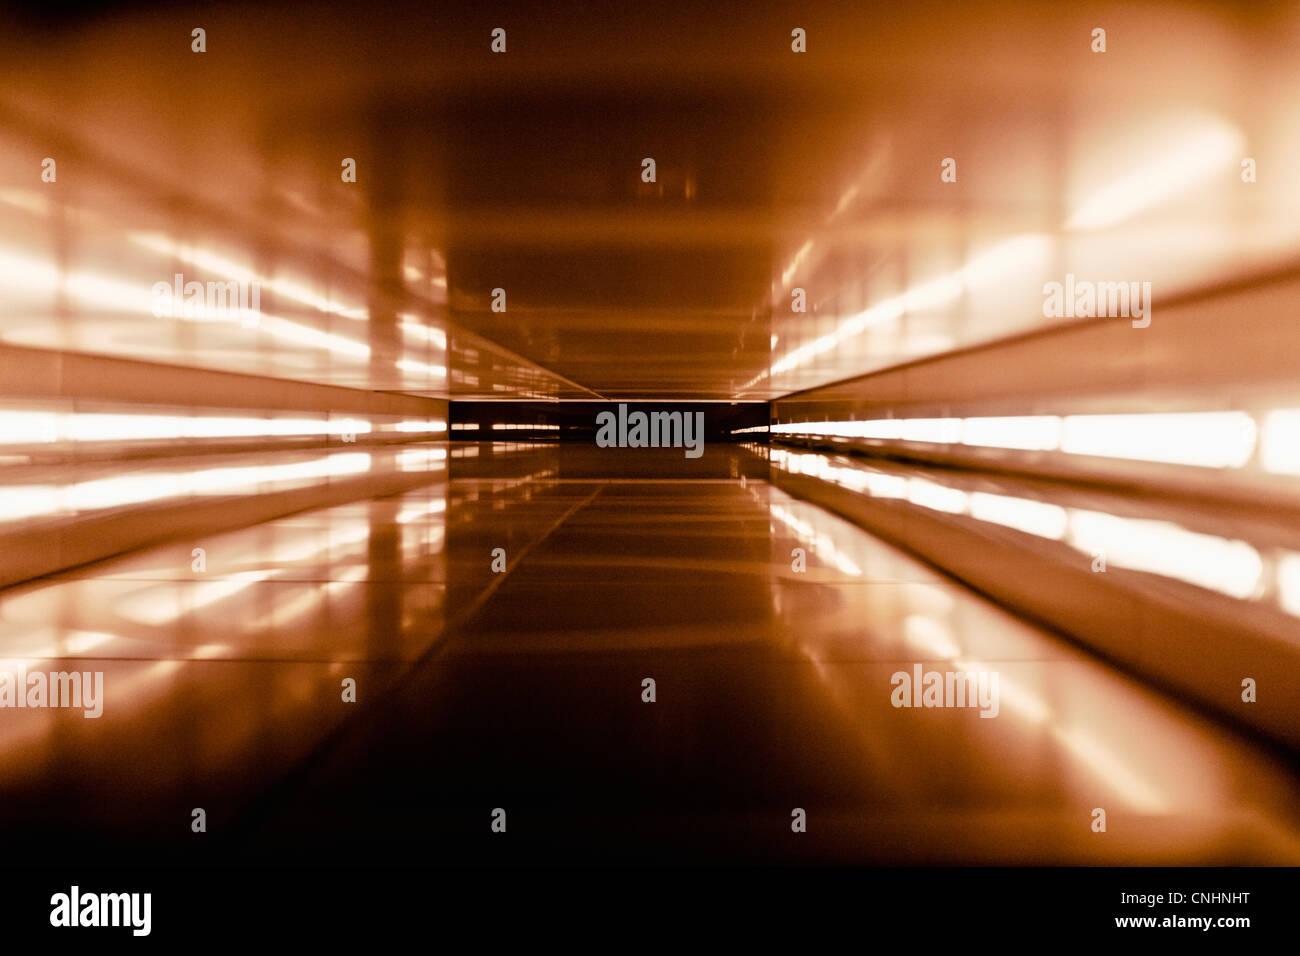 An abstract corridor in brown tones - Stock Image